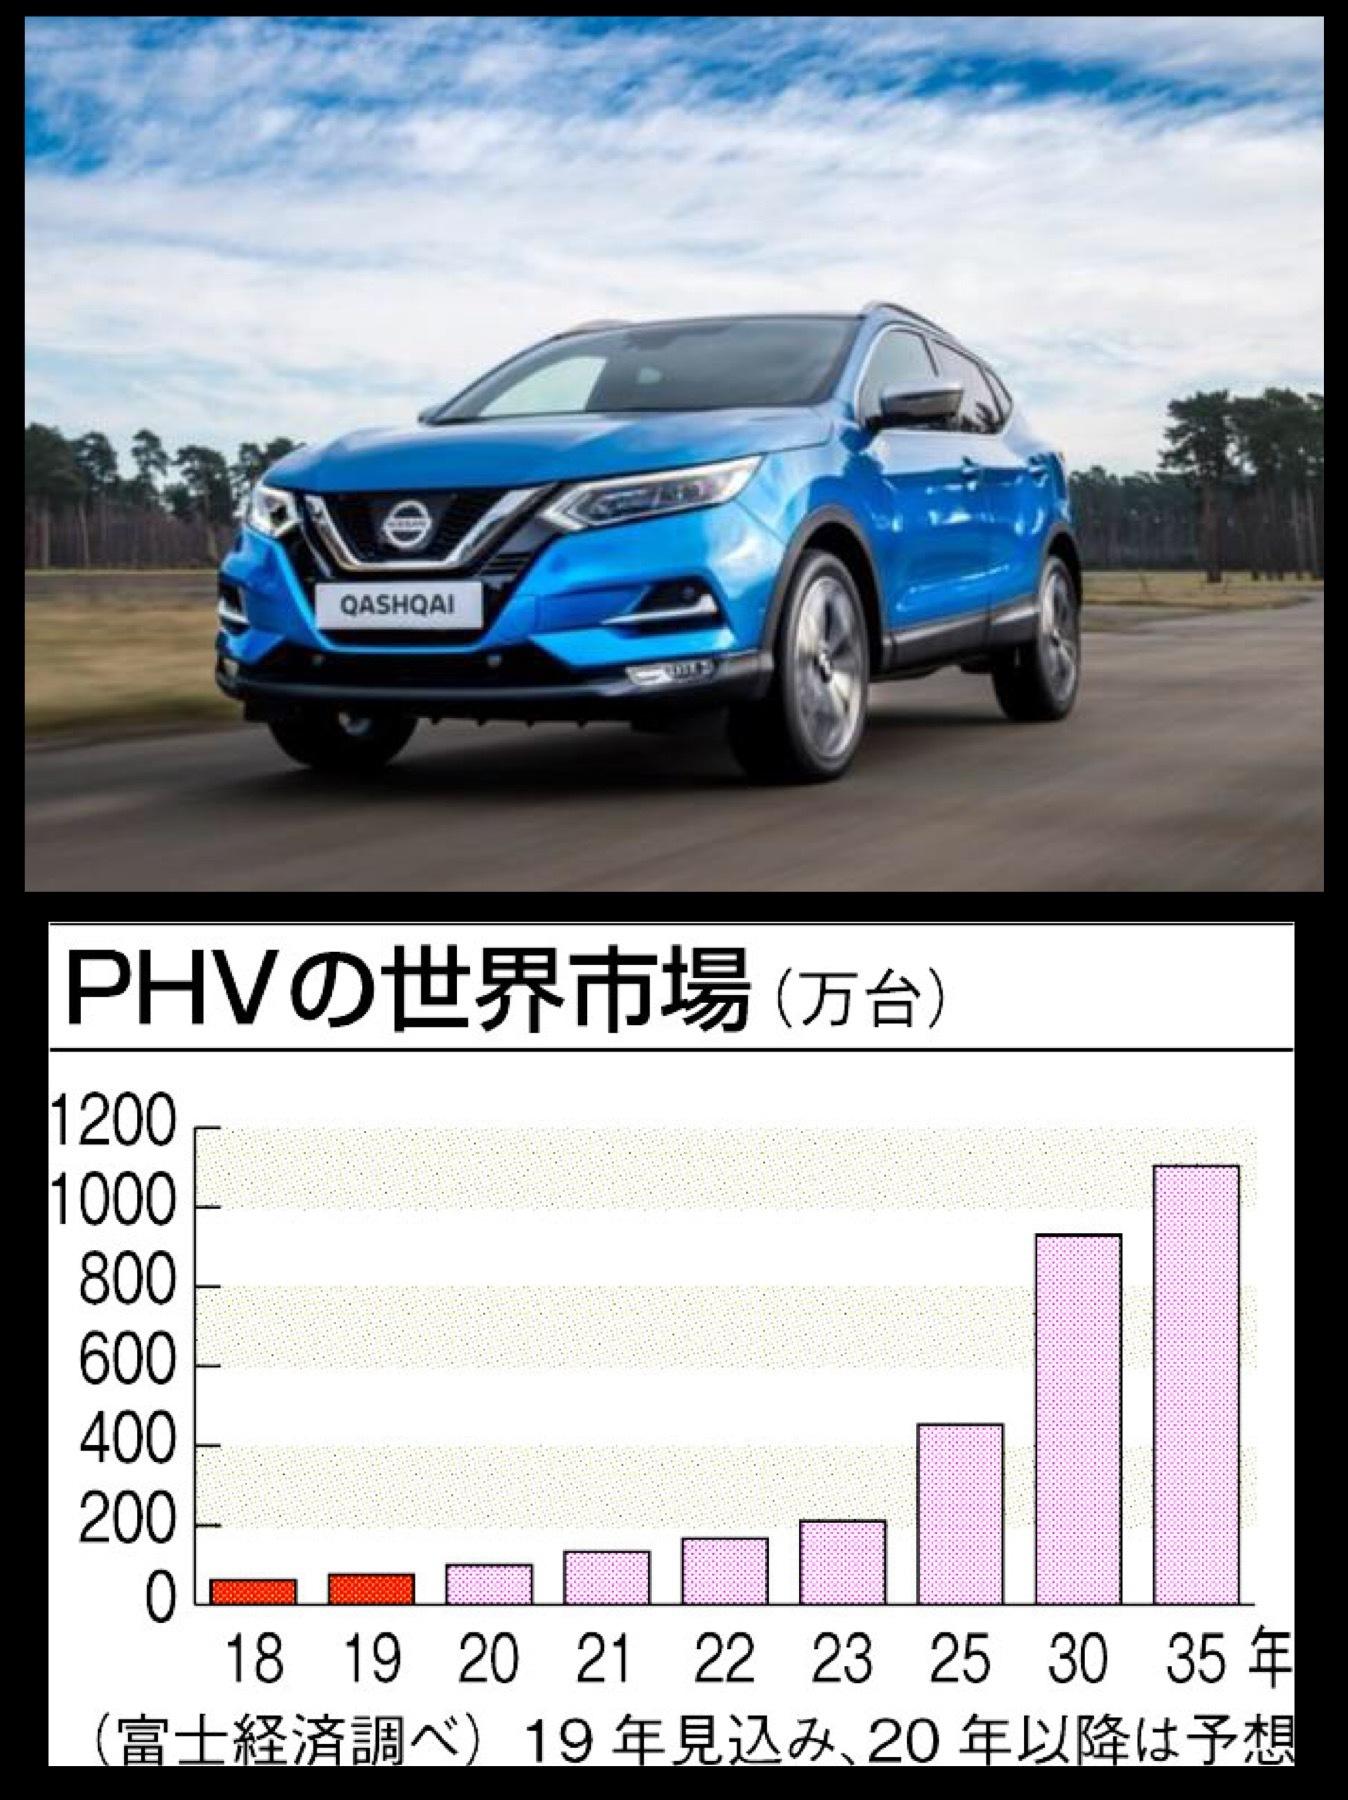 日産キャシュカイ 世界PHEV市場見込富士経済